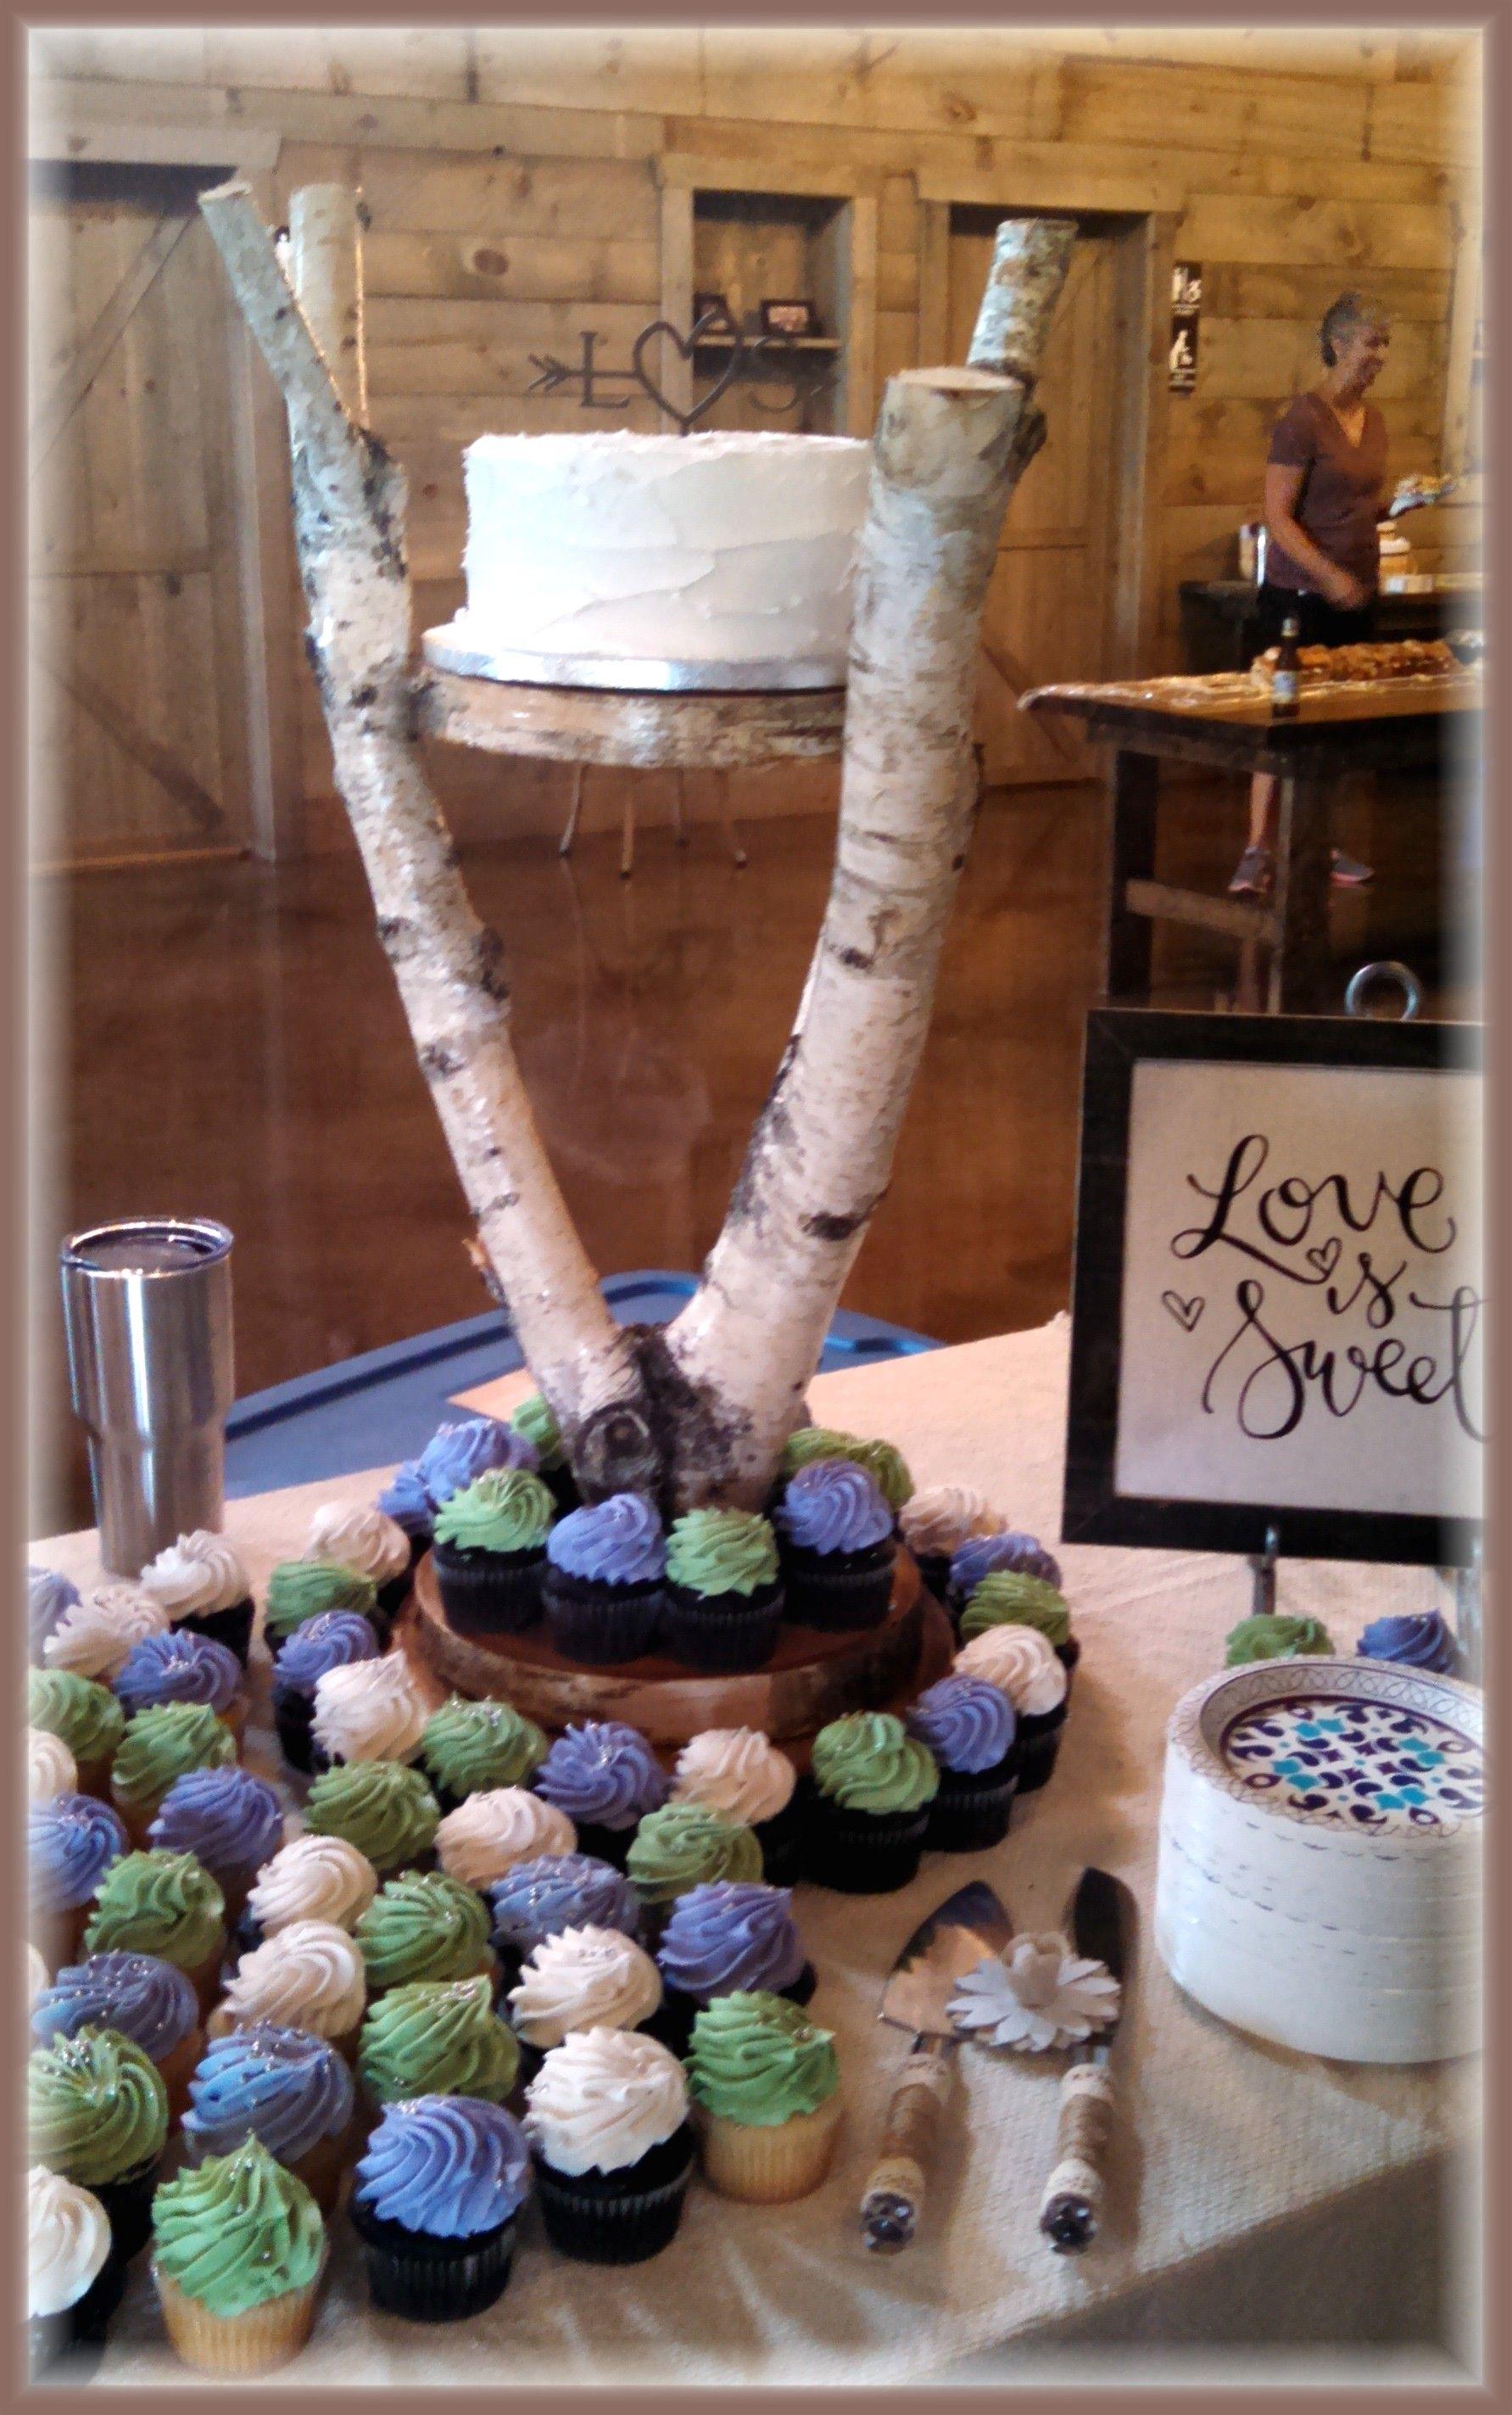 Cute rustic birch tree wedding cupcake stand with